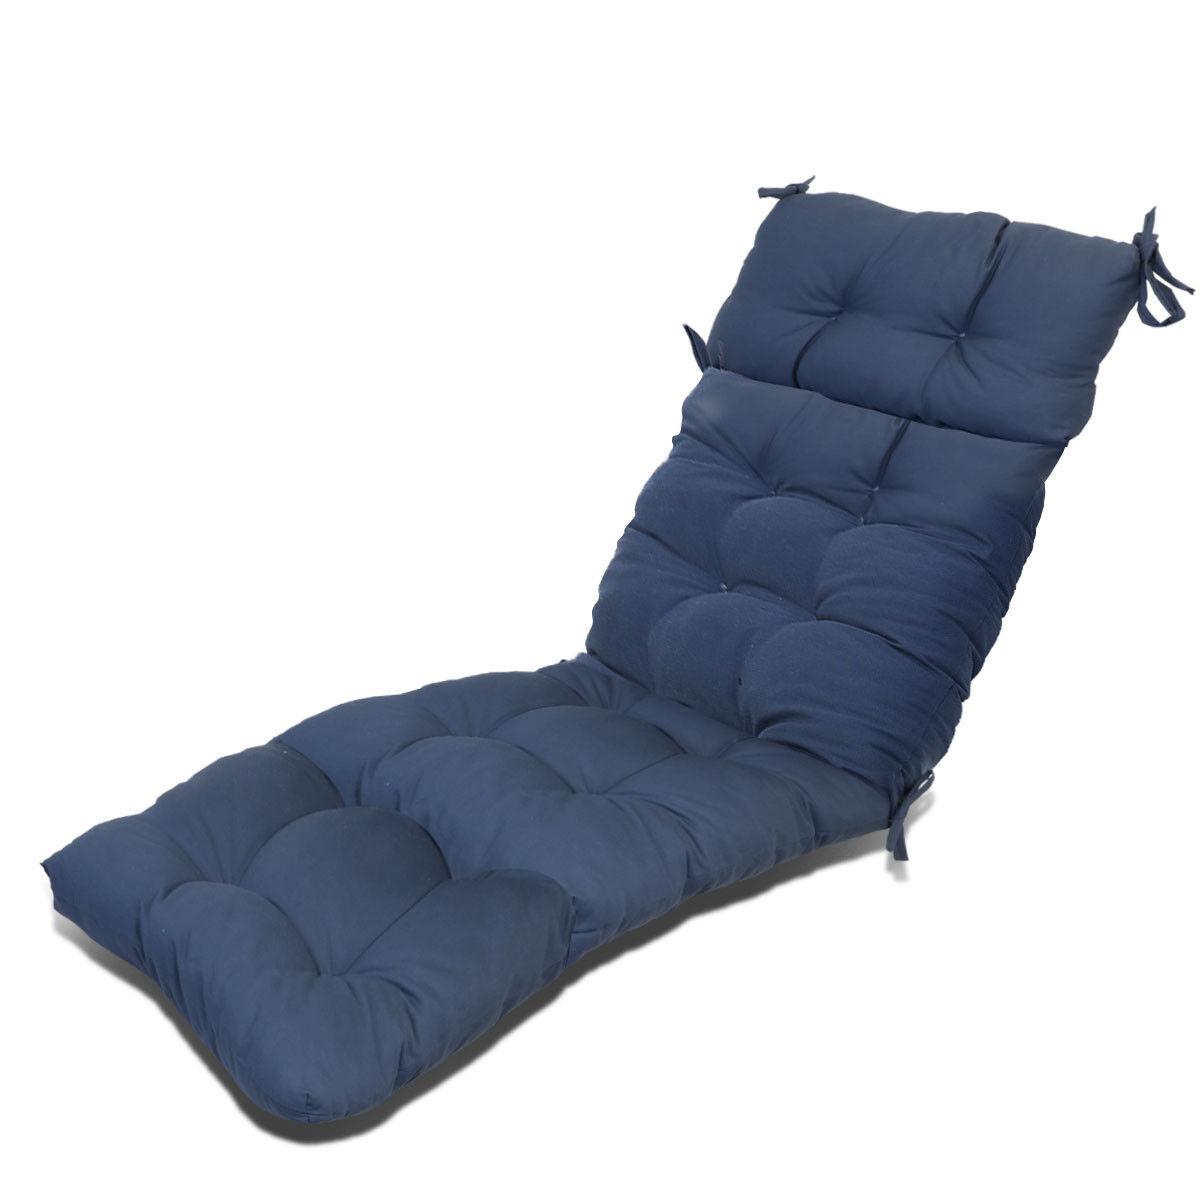 Outdoor Patio Pretty Wicker Chaise Lounge Chair Cushion ...